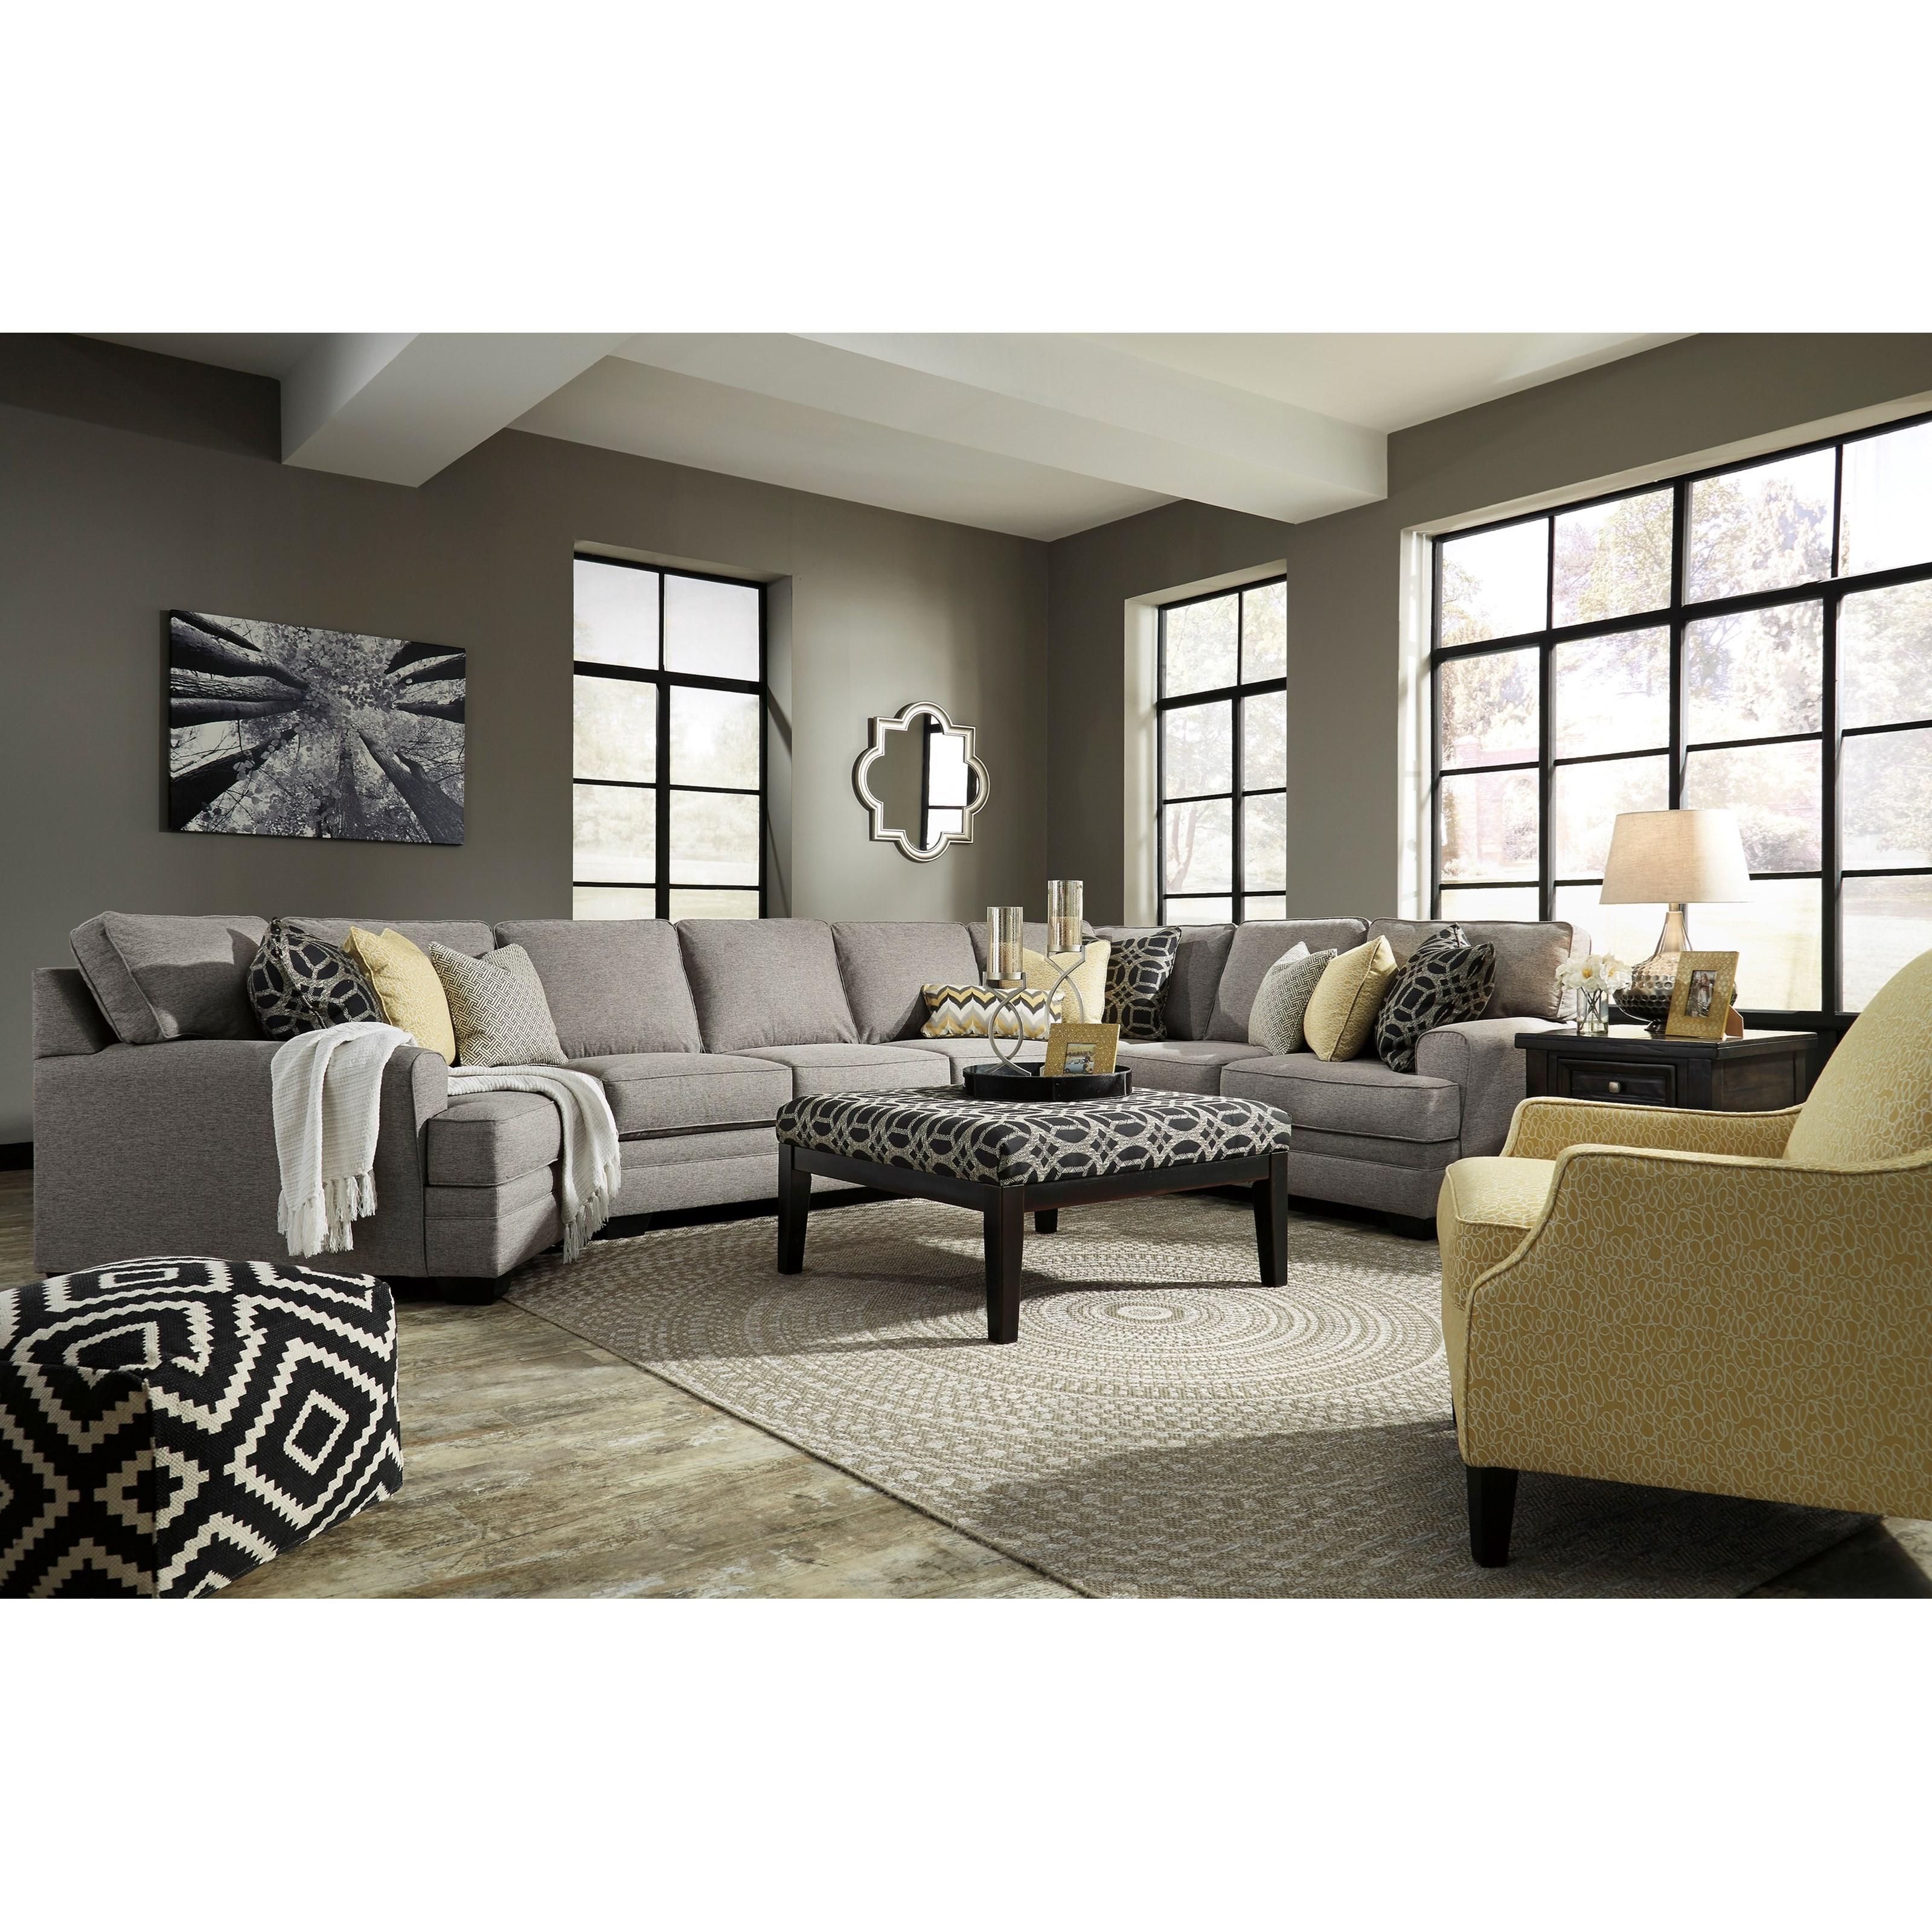 Benchcraft Cresson Stationary Living Room Group Fashion Furniture Stationary Living Room Groups